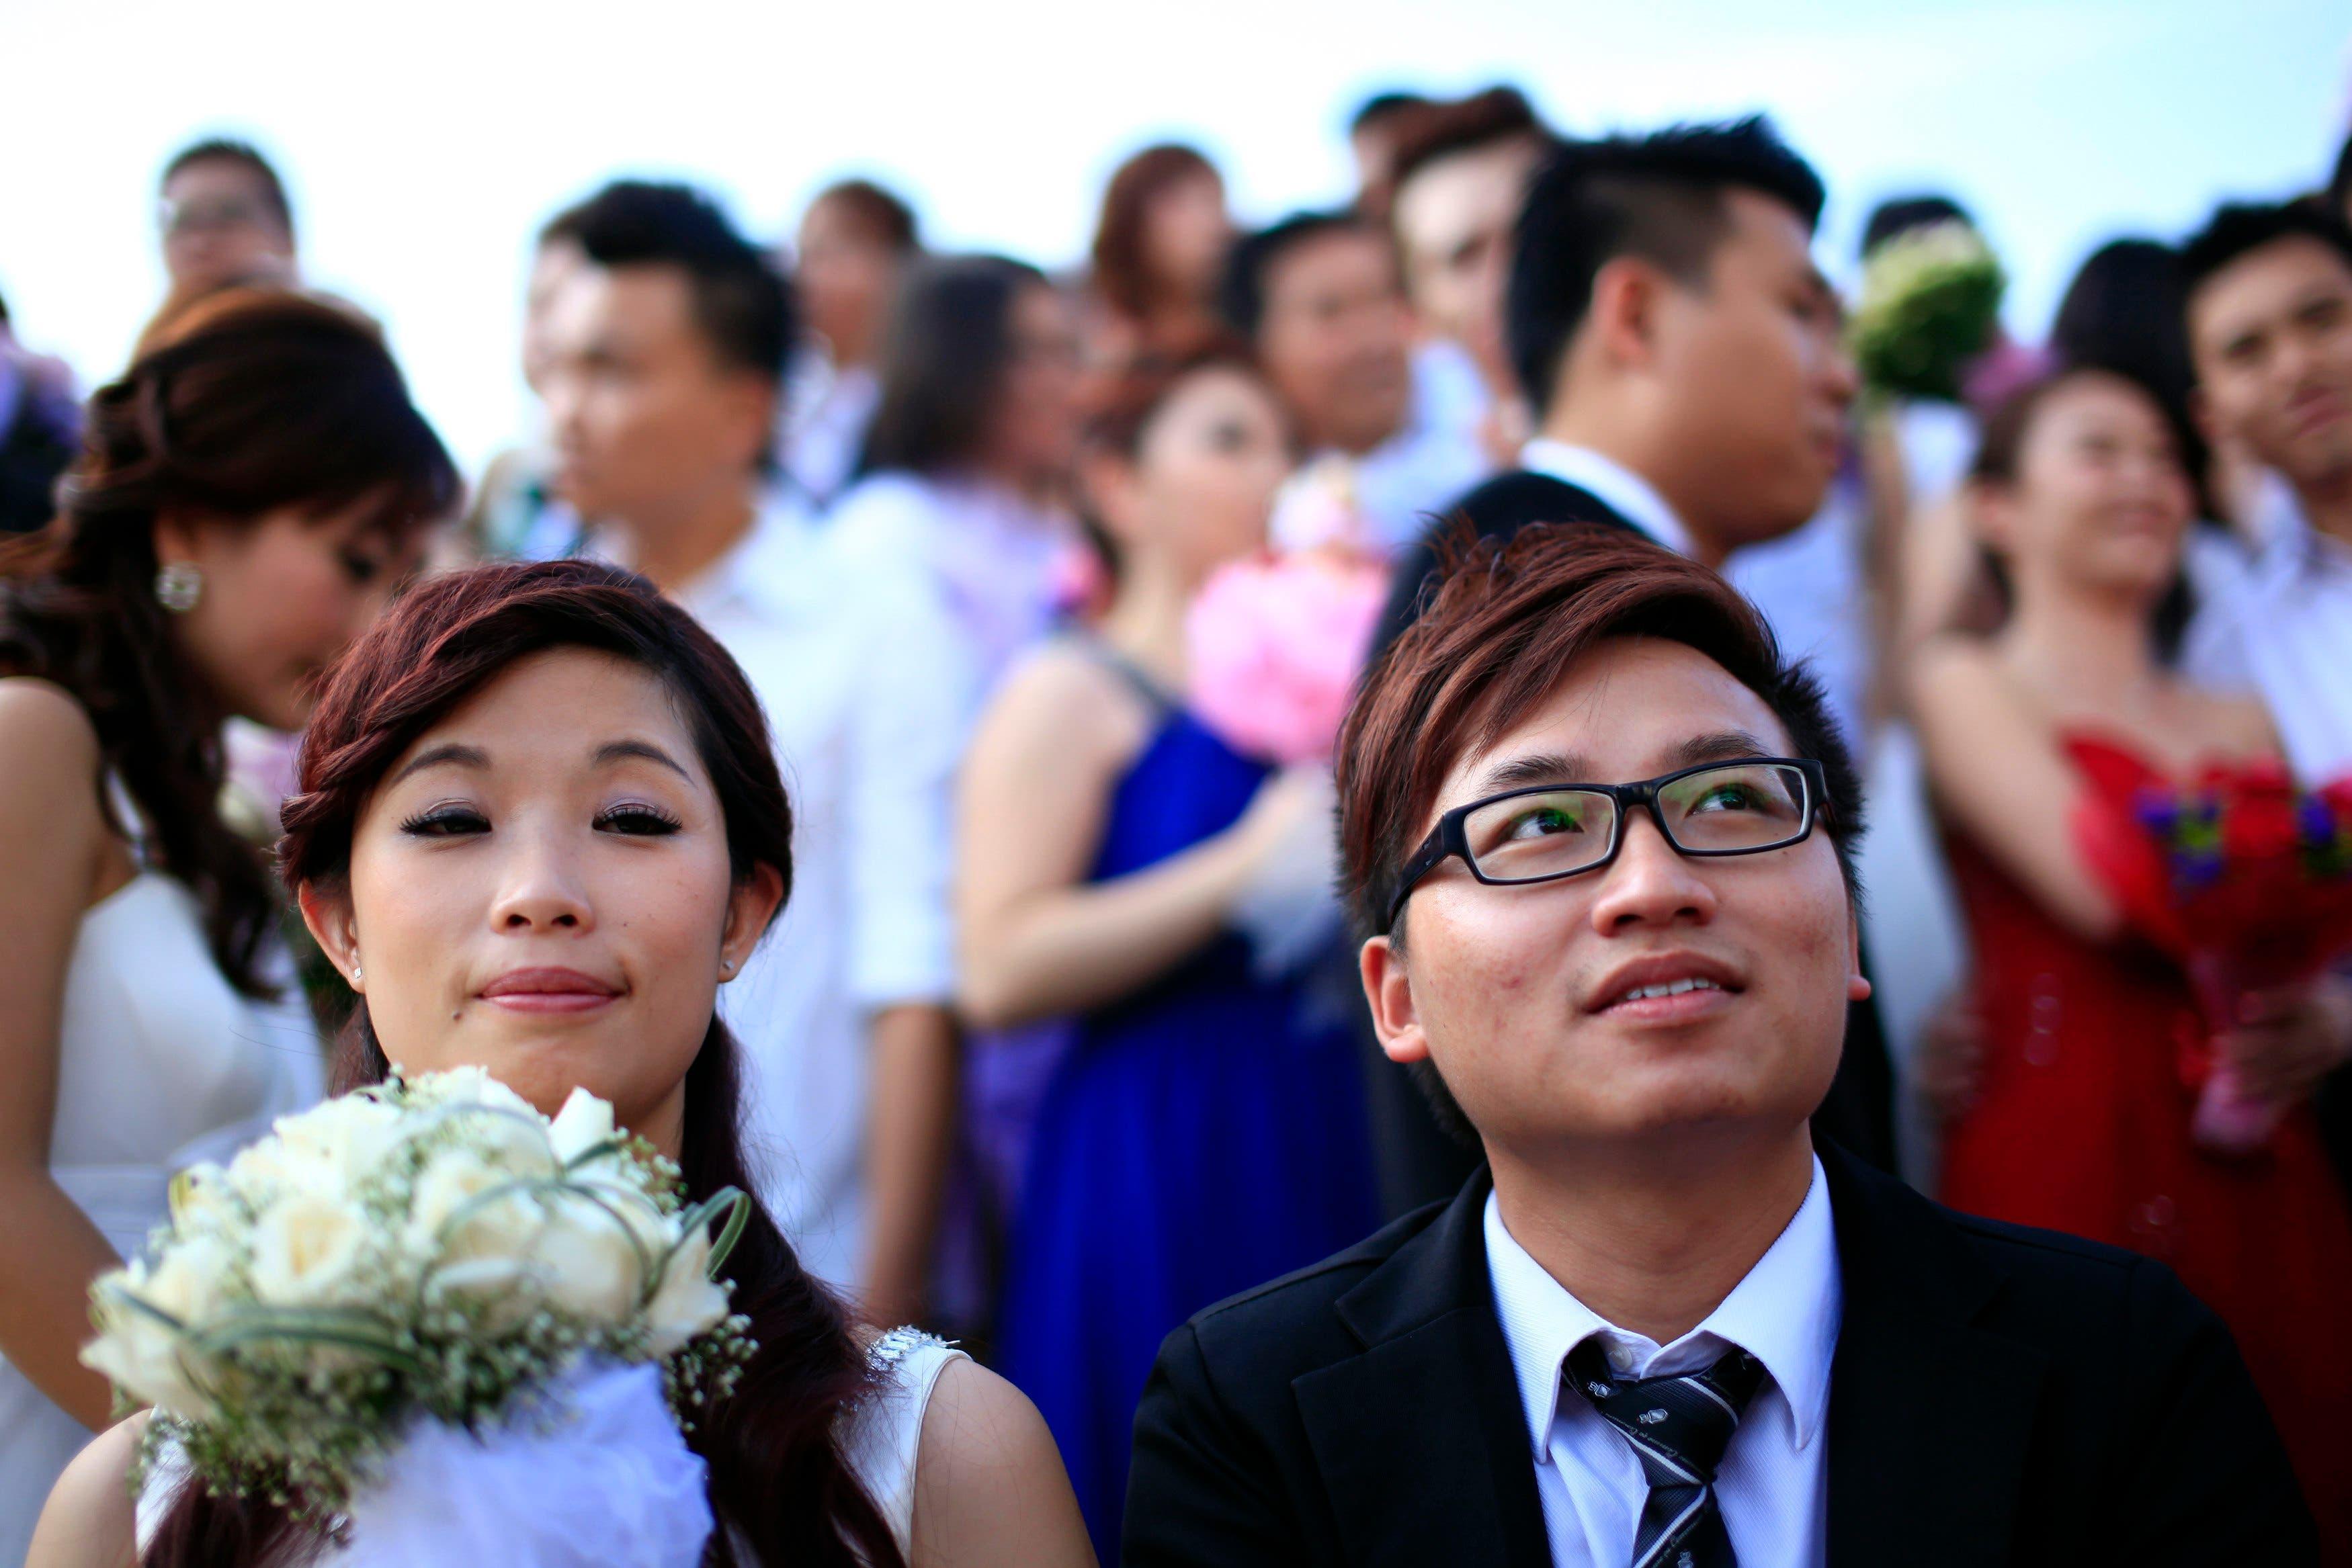 Love birds tie the knot in Malaysia mass wedding